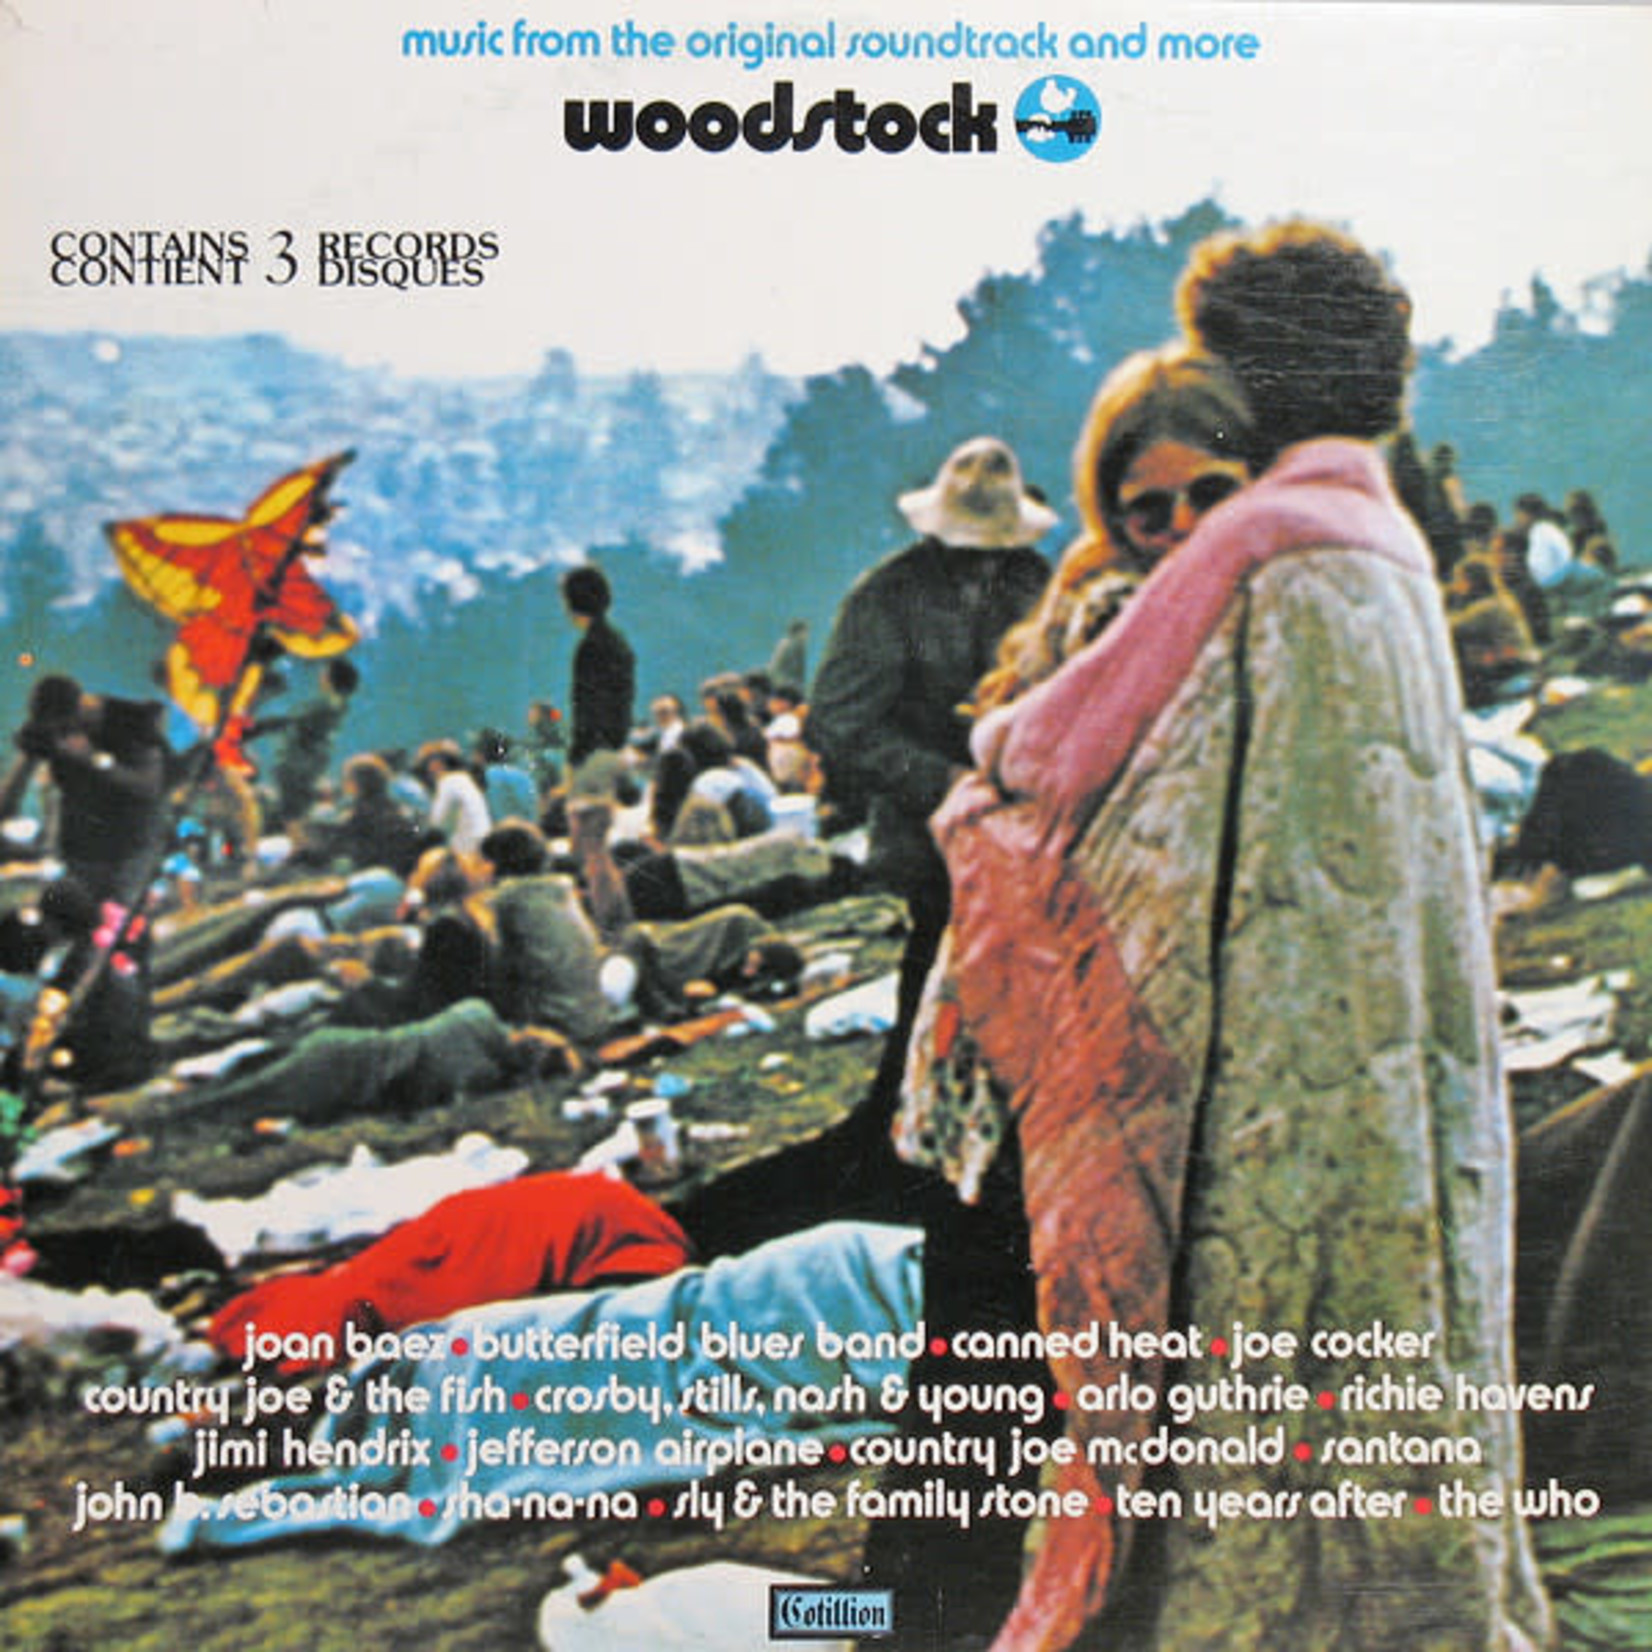 Vinyl Woodstock 1 - Soundtrack